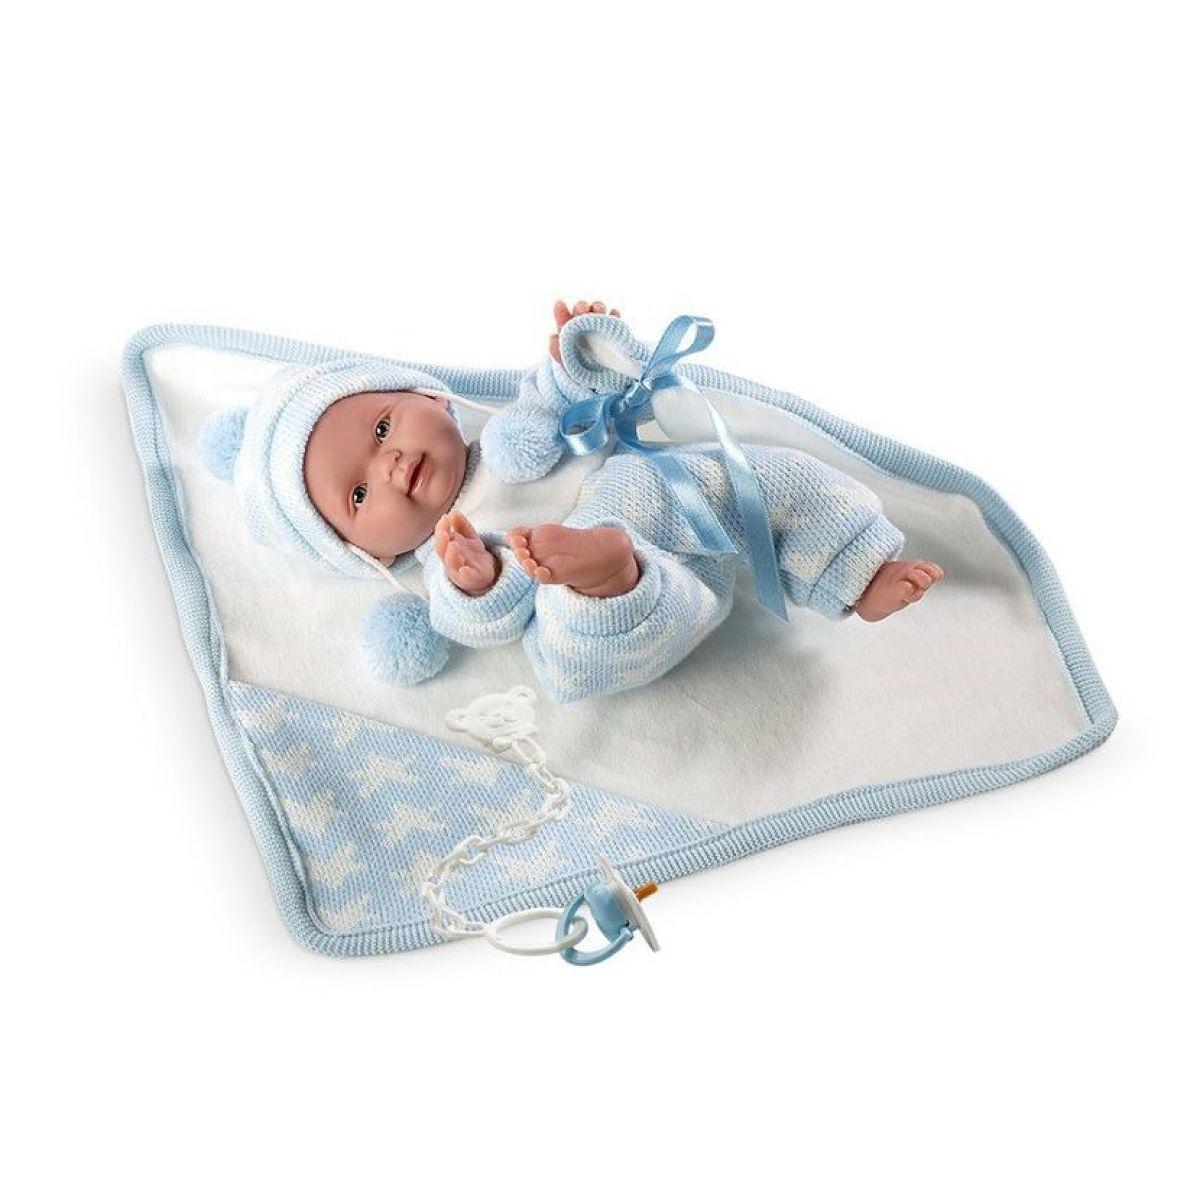 Llorens bábika New Born chlapček - Poškodený obal